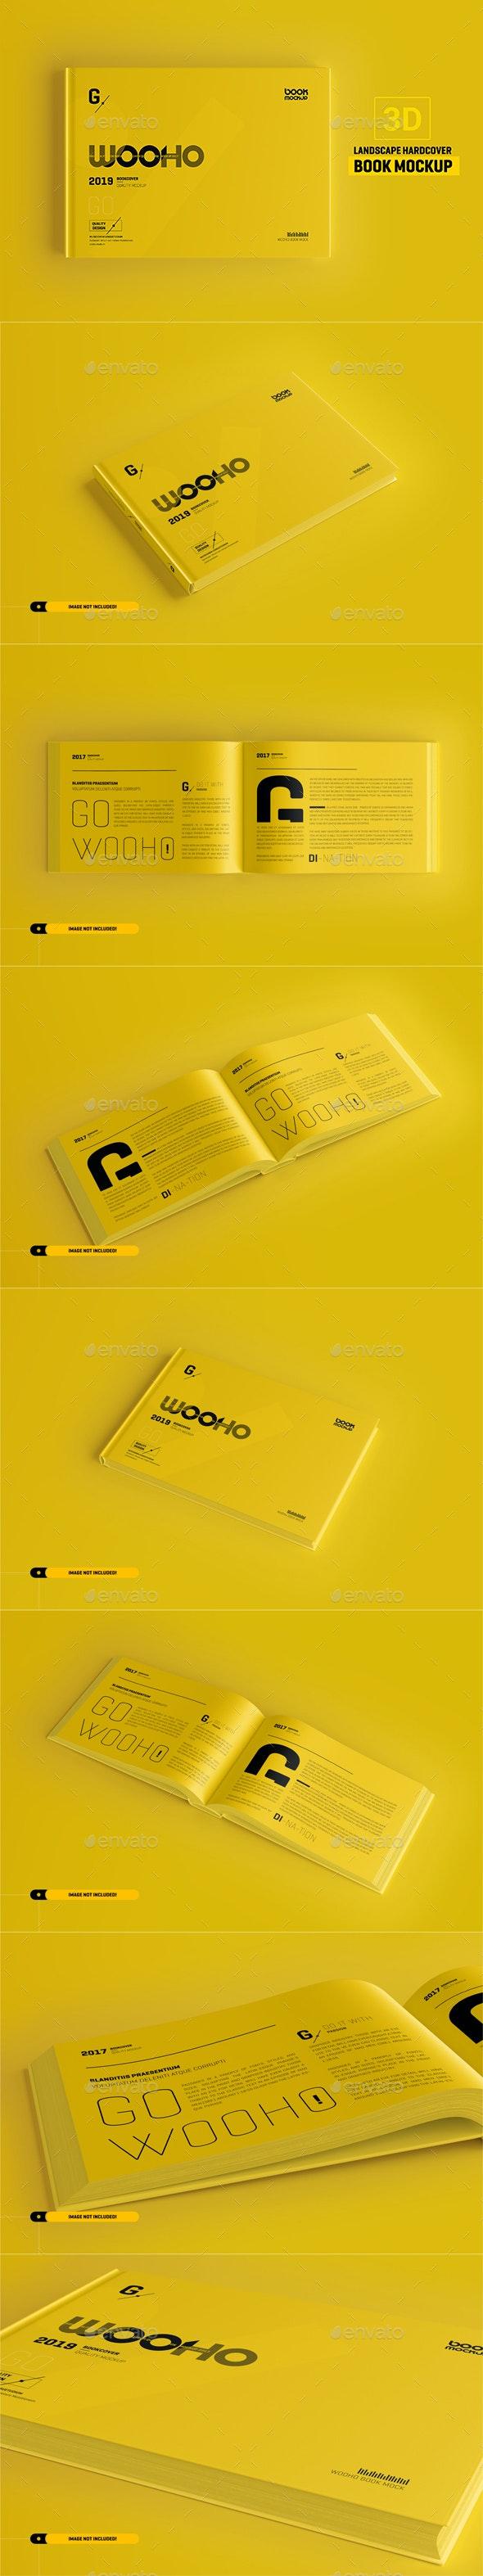 Landscape Book Mockup / Hardcover - Books Print